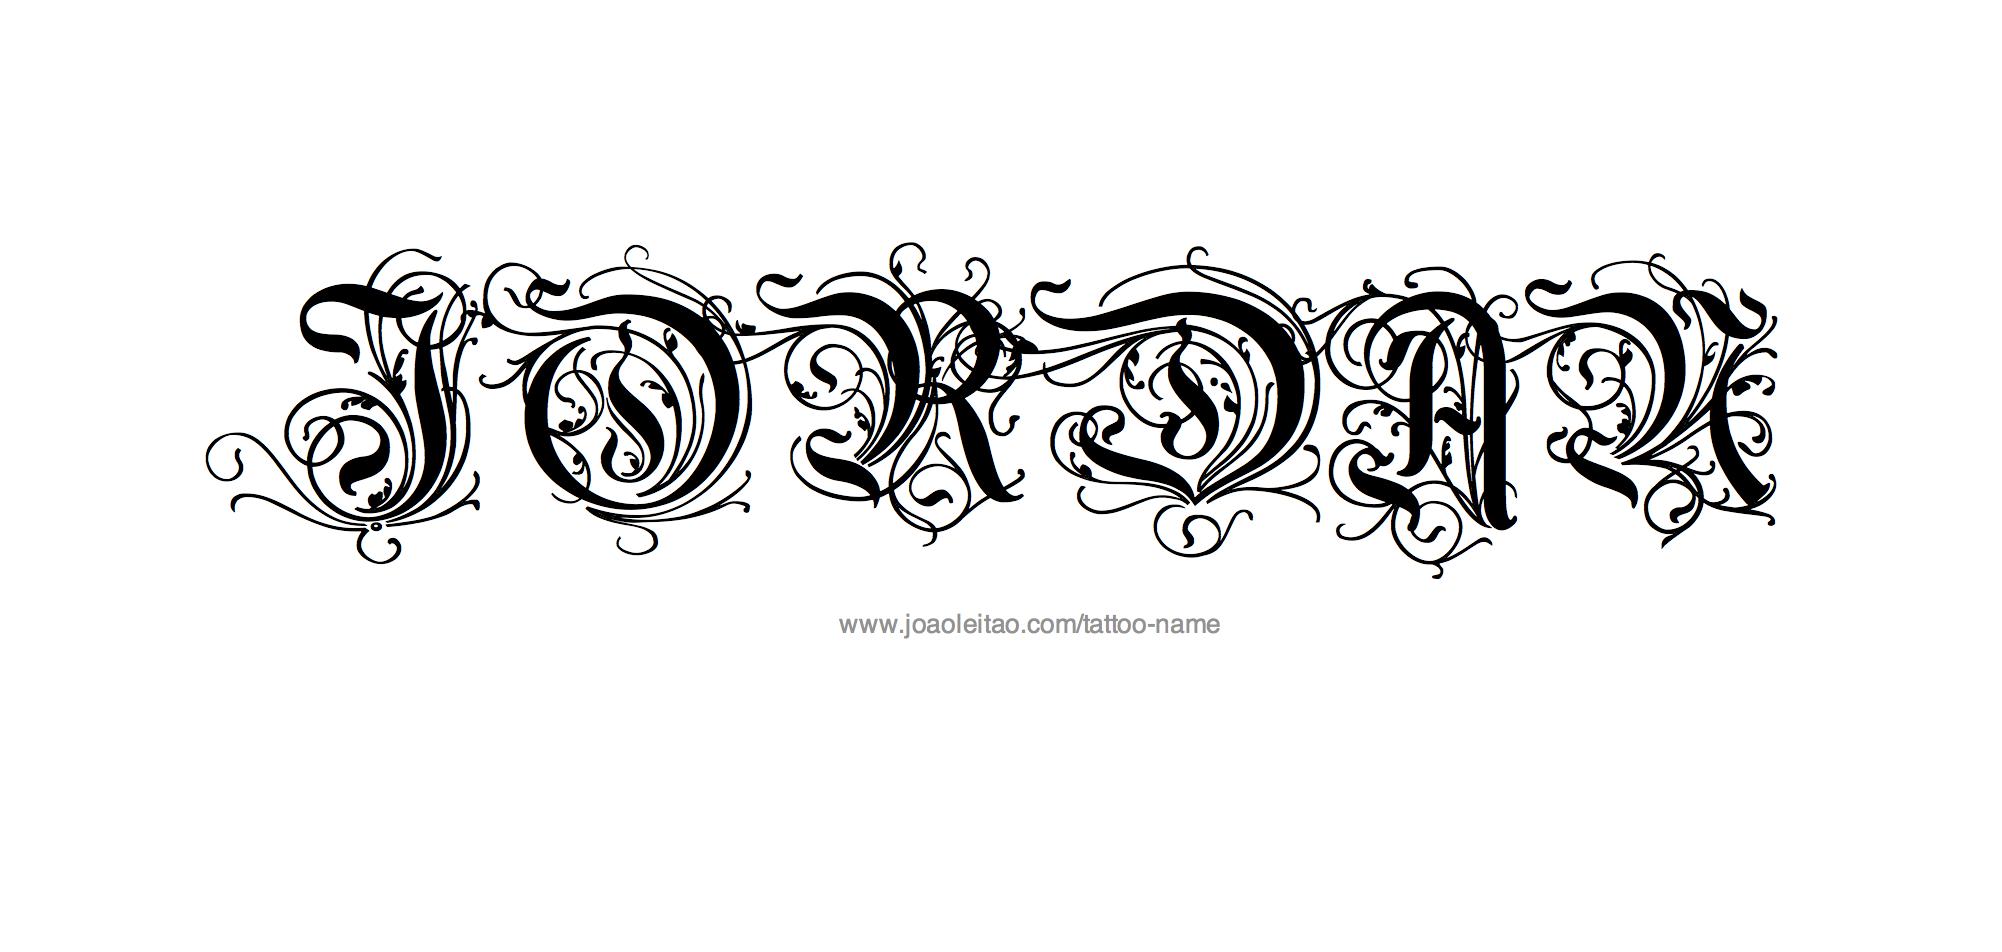 jayden name tattoo design idea for rib cage tattoo for man name tattoos. Black Bedroom Furniture Sets. Home Design Ideas